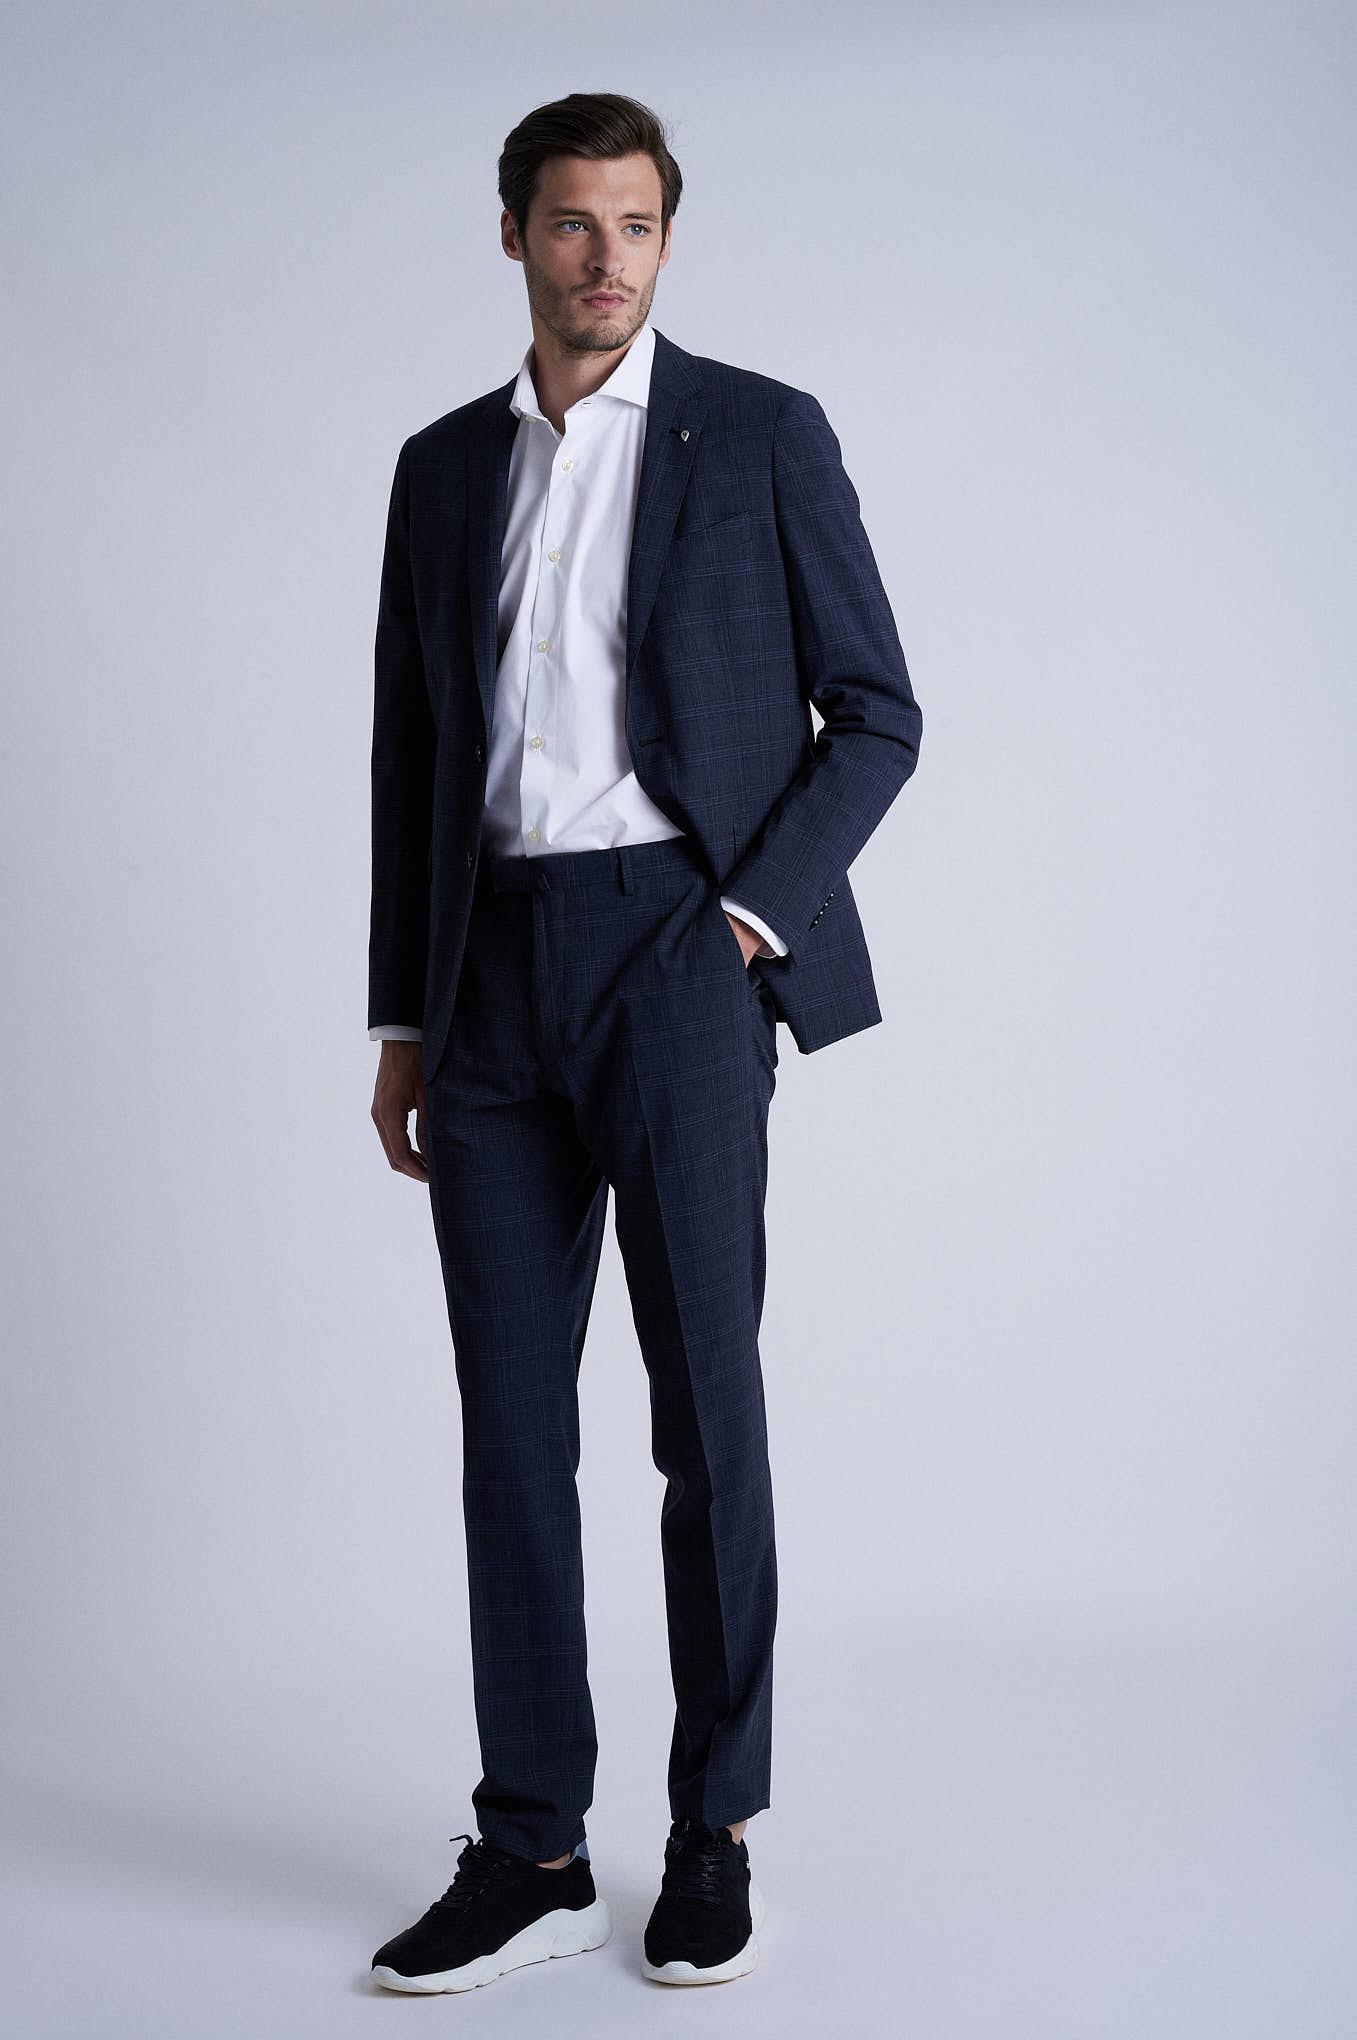 Suit Dark Grey Formal Man